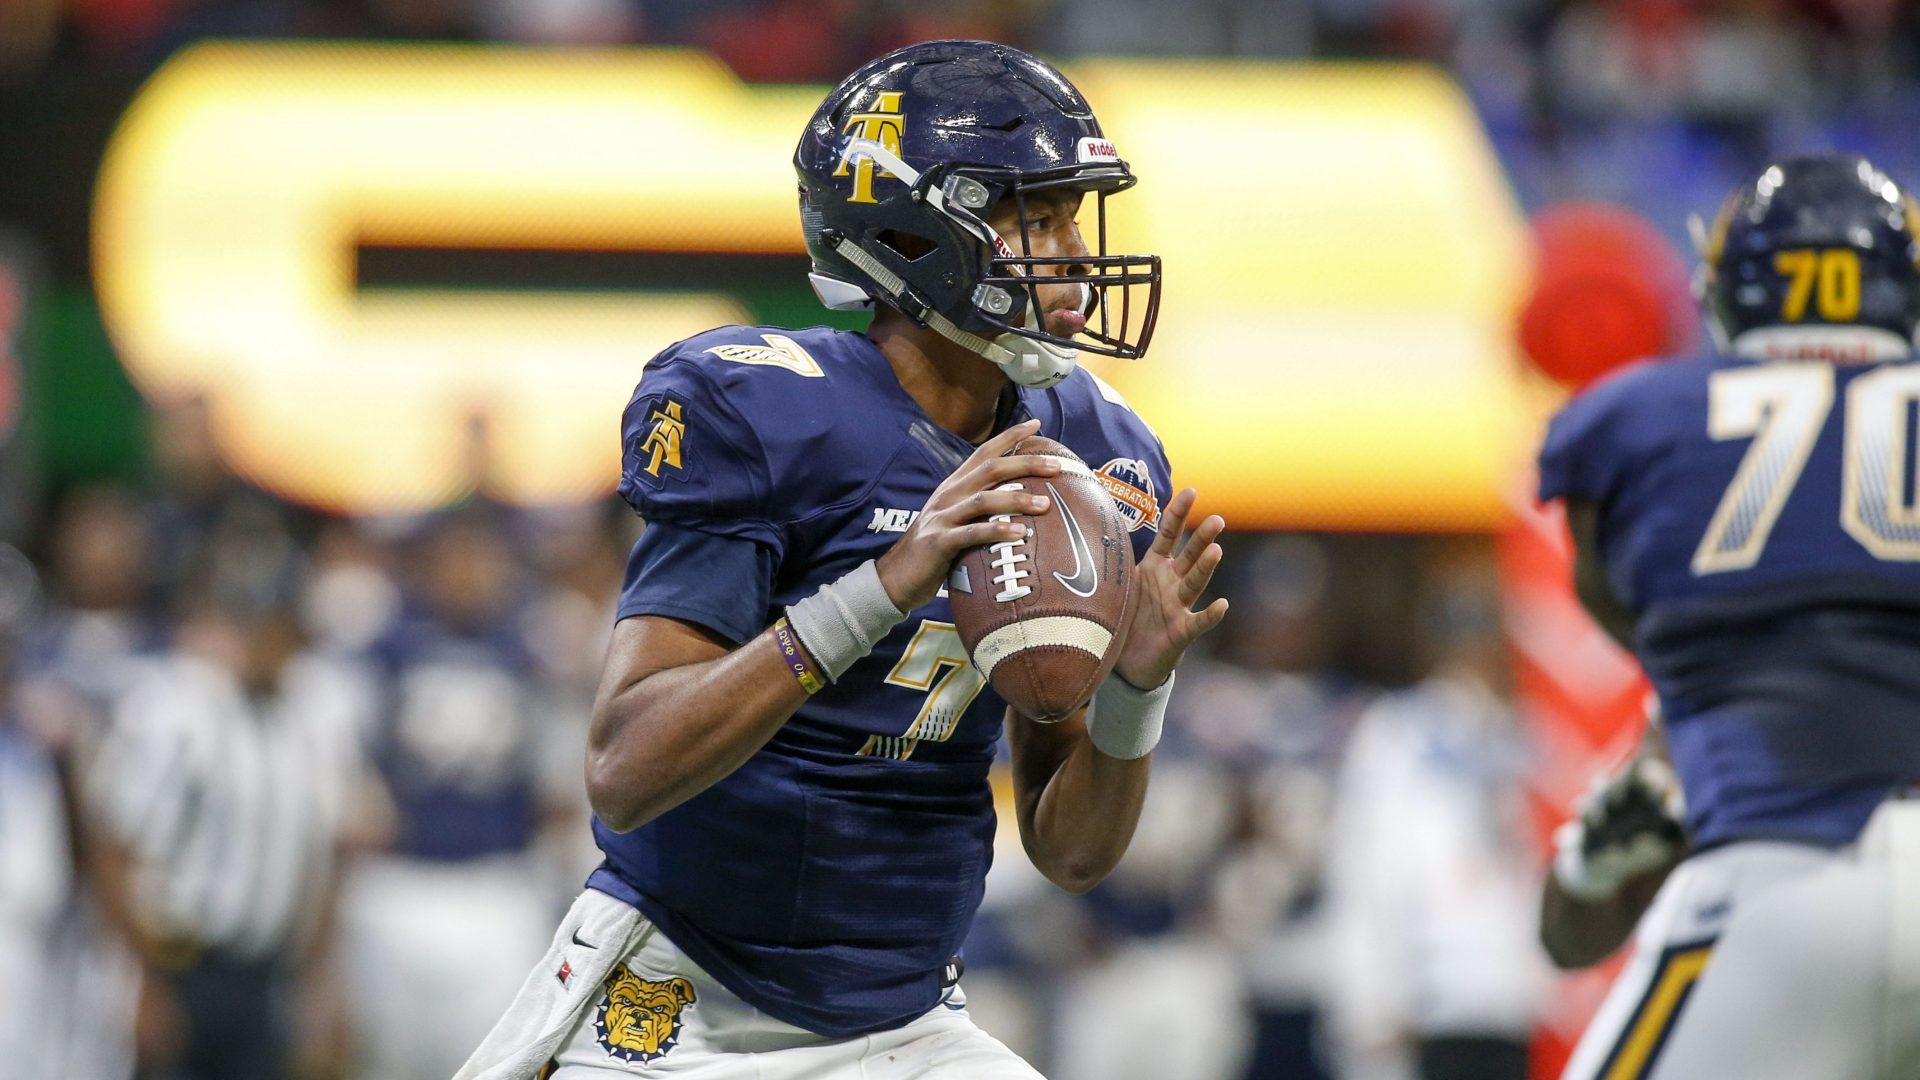 NCAA/HBCU Football: Celebration Bowl-Grambling vs North Carolina A&T